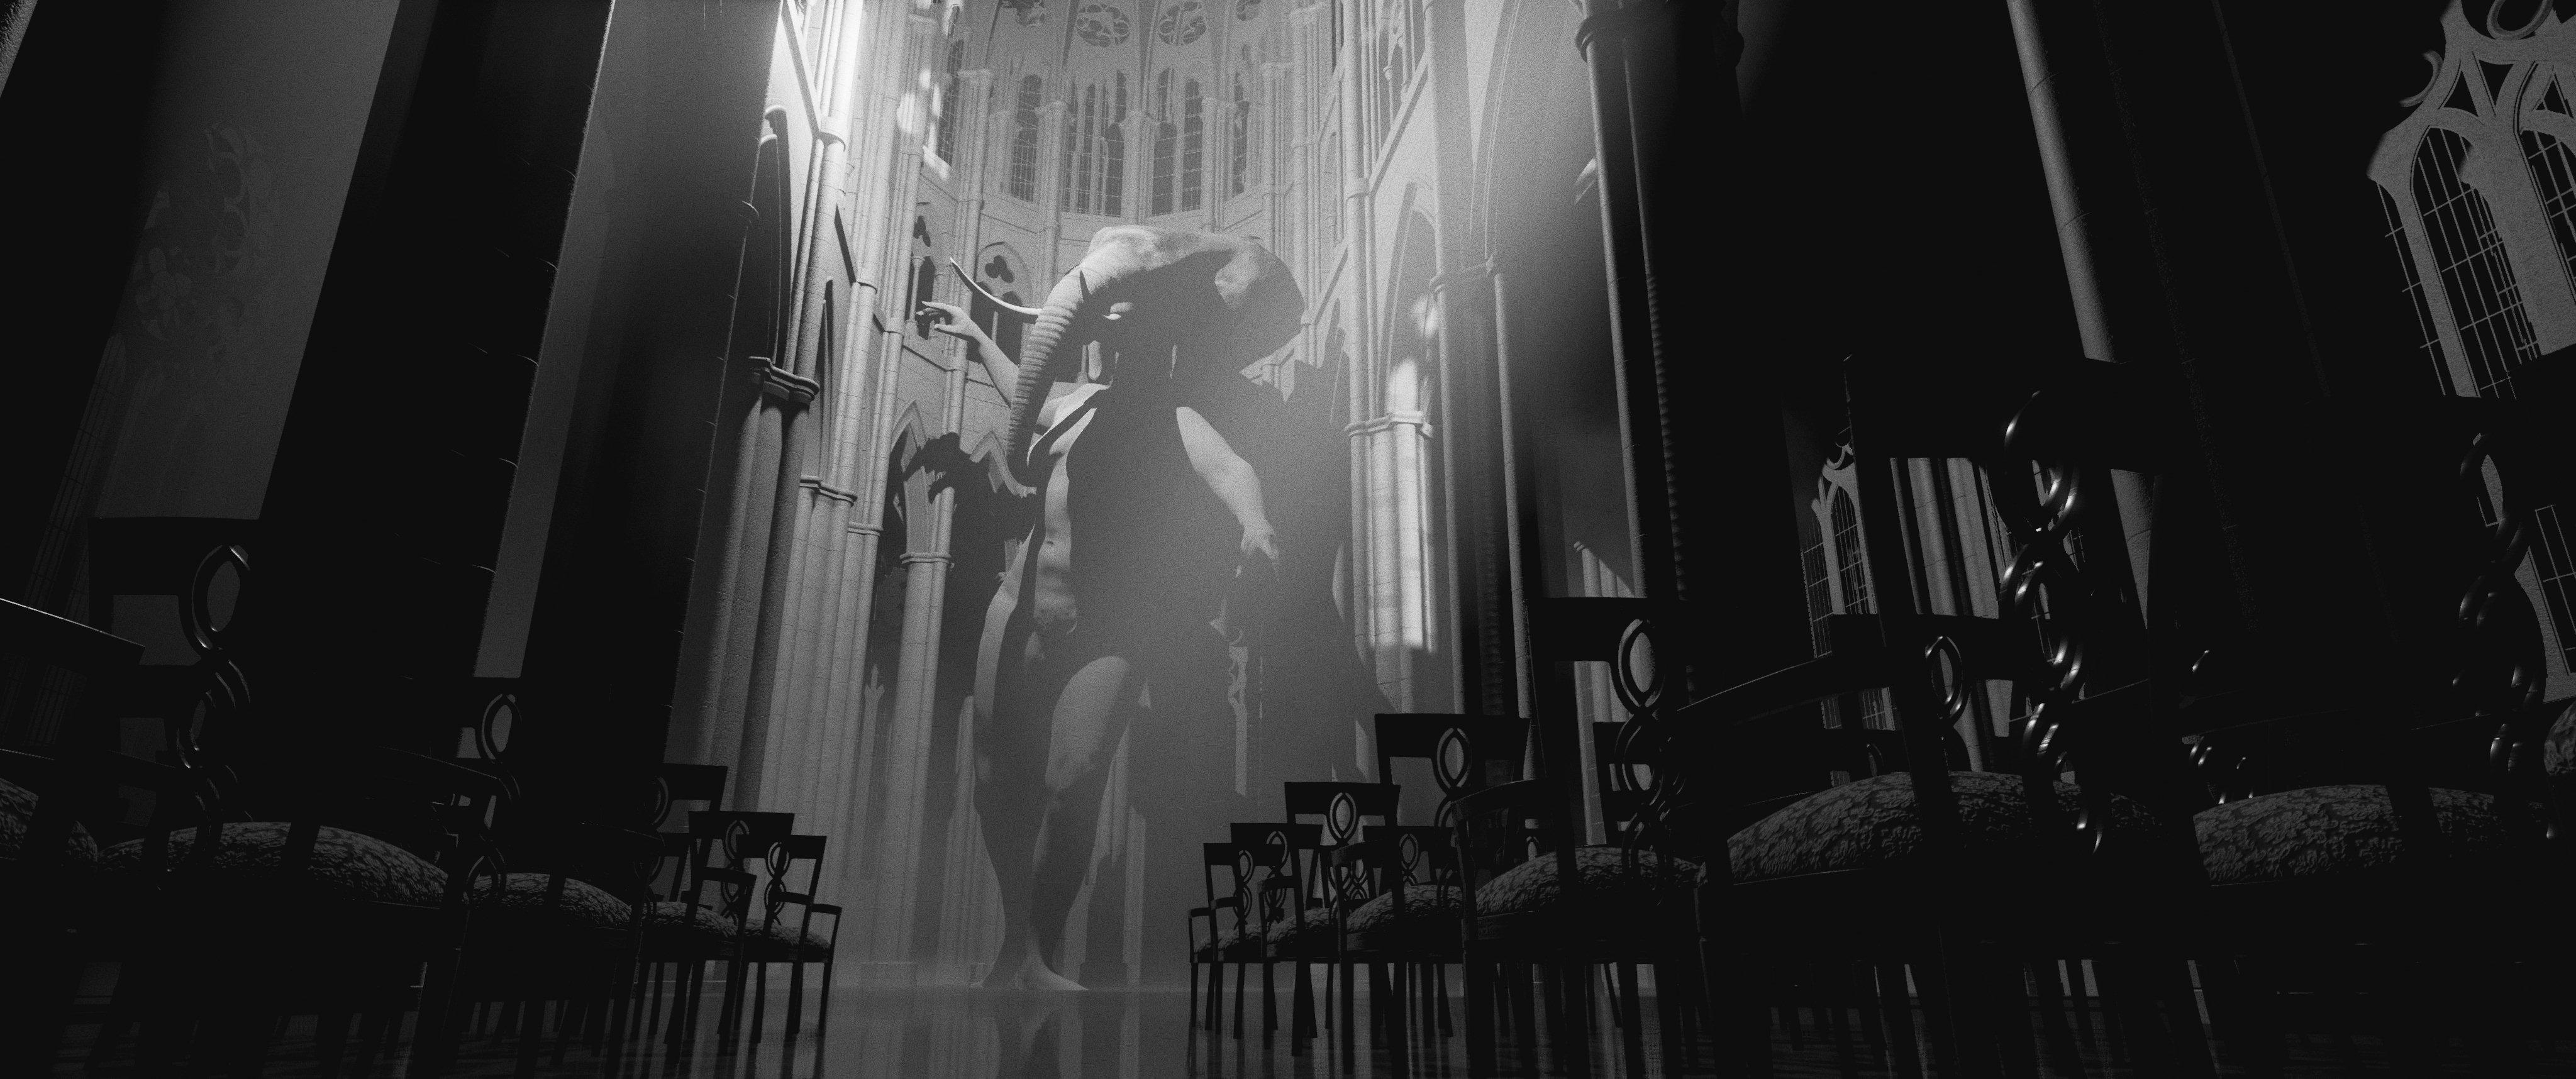 Dave Berg: God Rot Their Souls (2016)